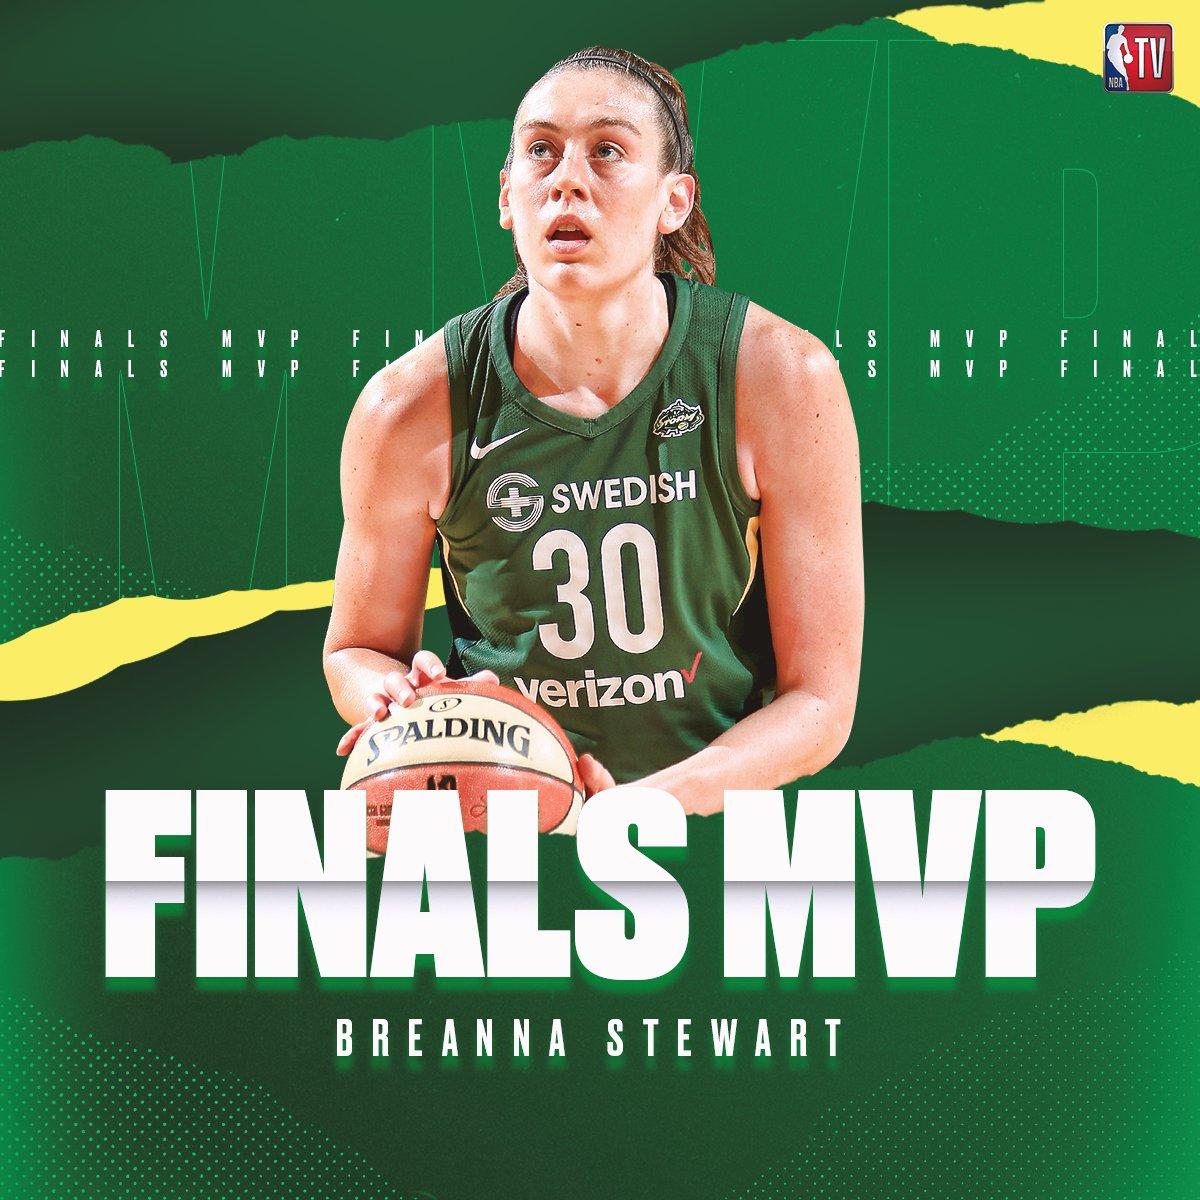 WNBA MVP + WNBA Finals MVP   What a season for @breannastewart! <br>http://pic.twitter.com/dviH7v65Rf